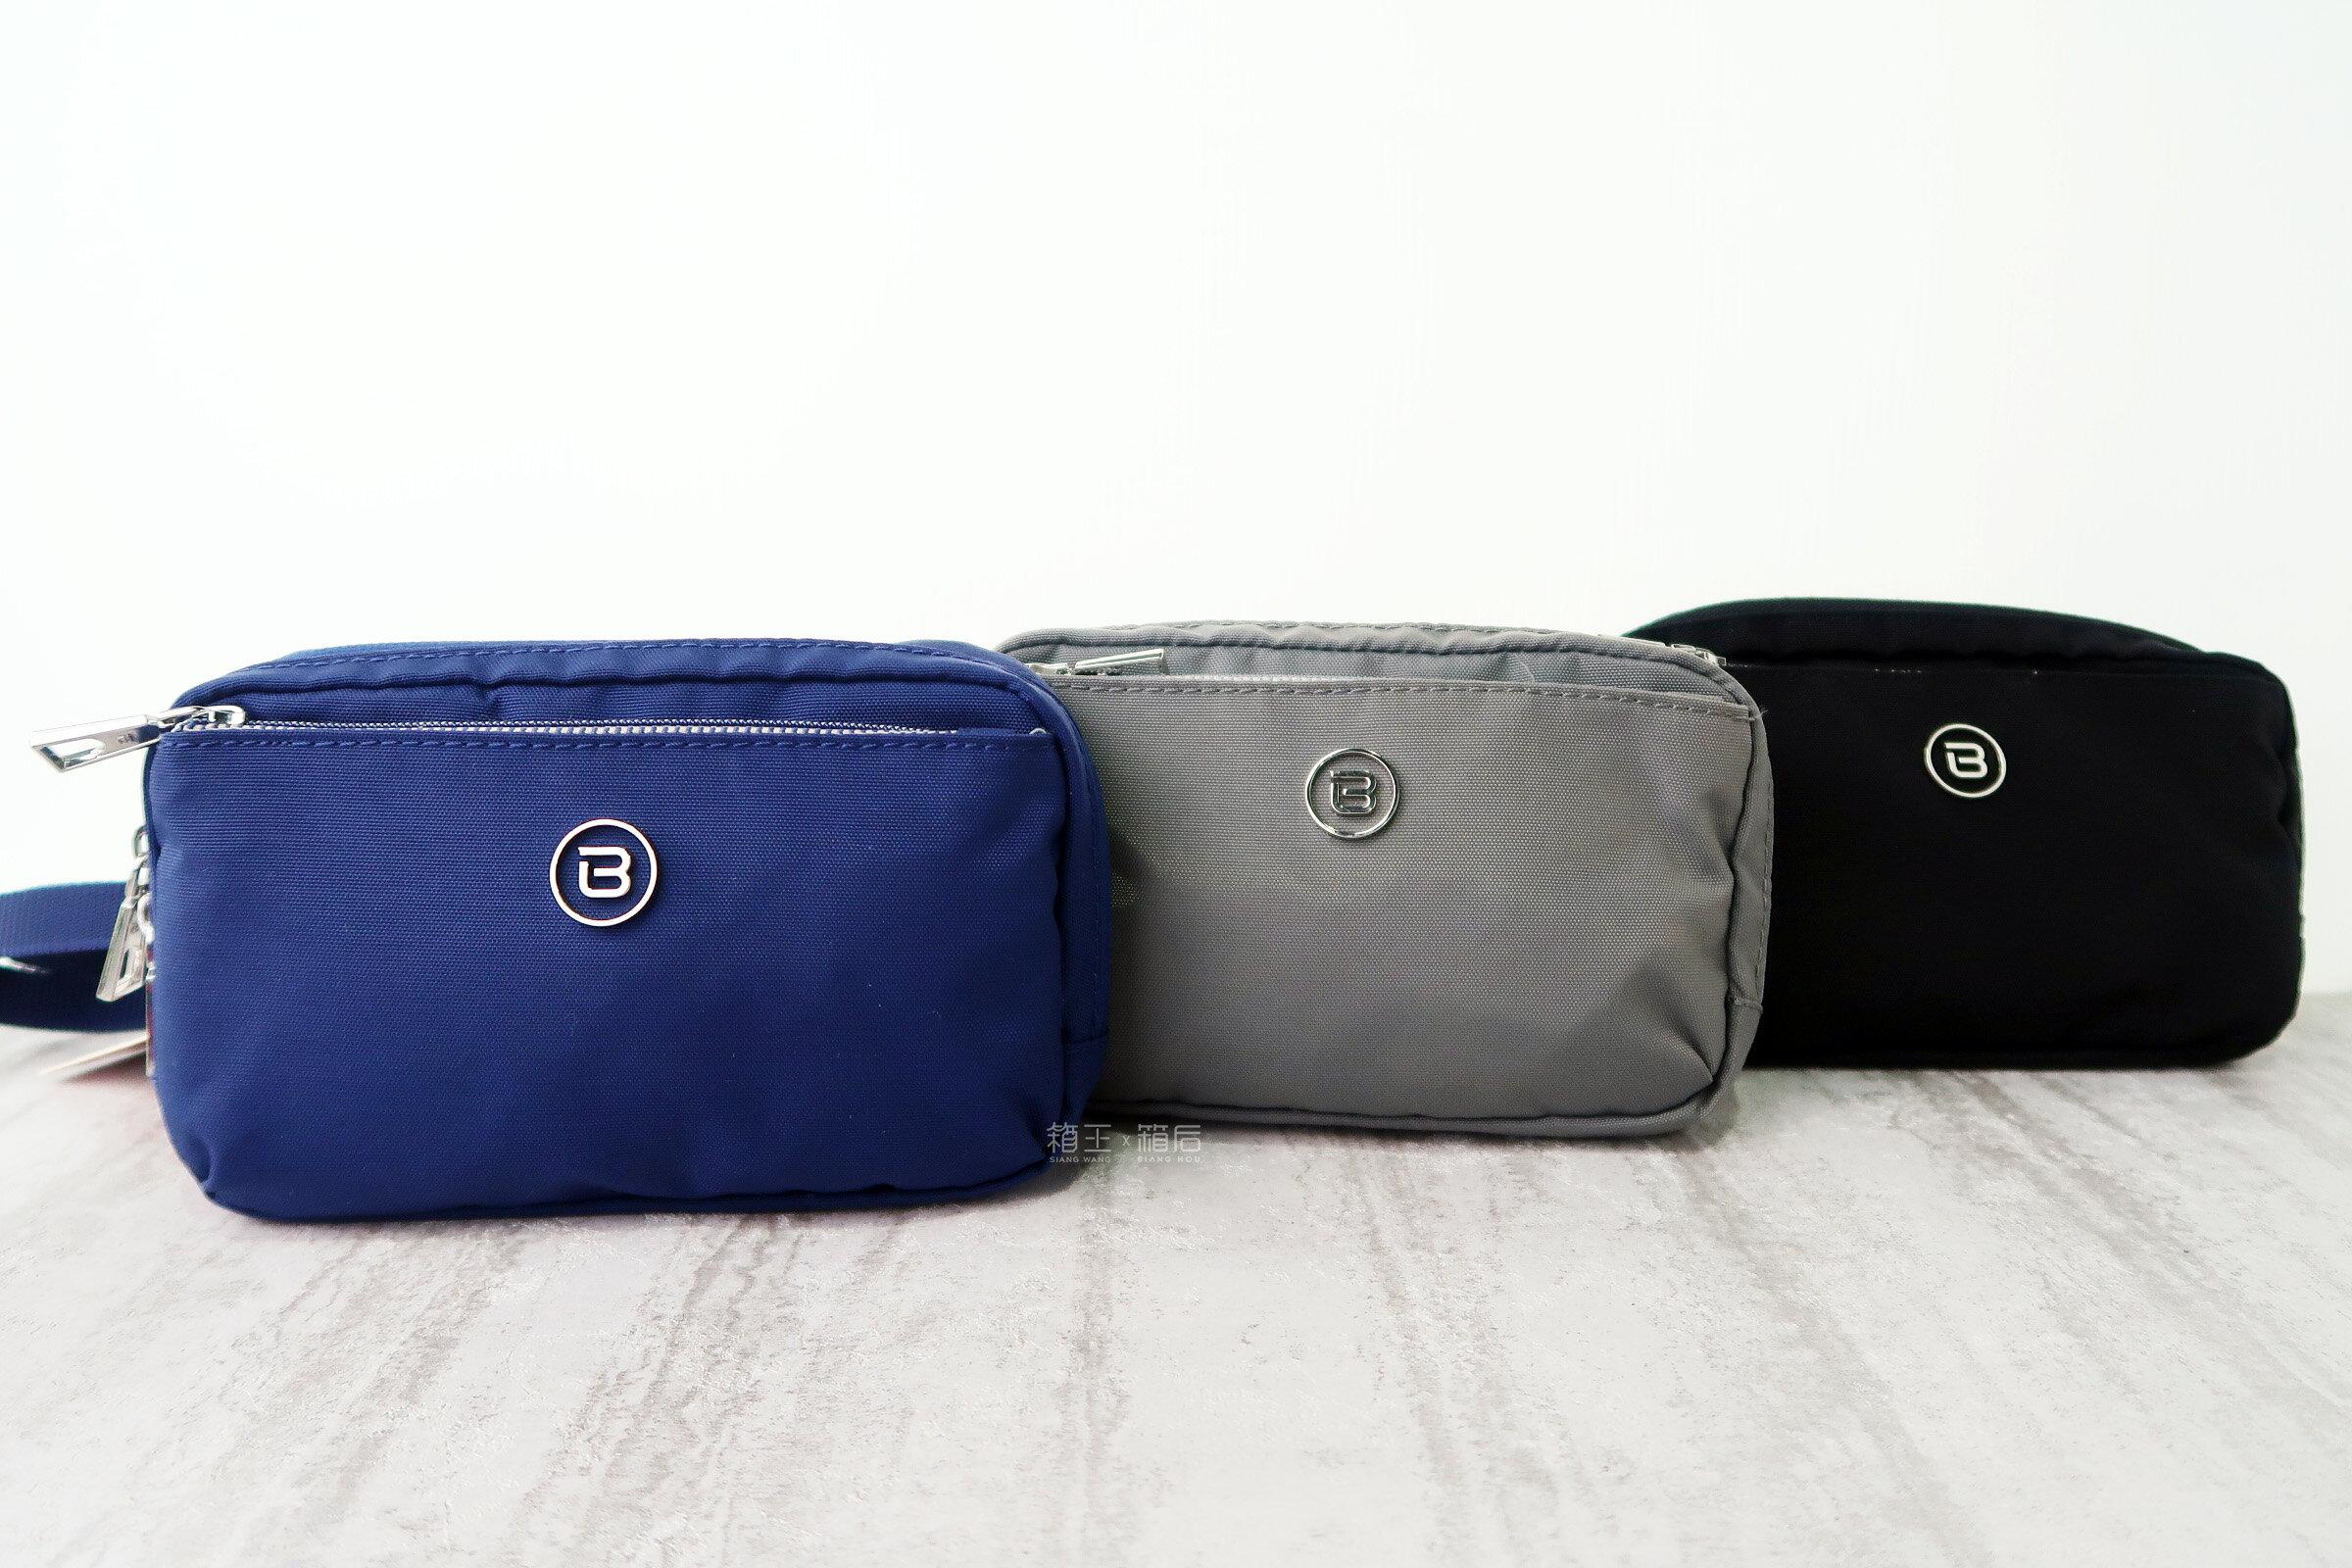 BESIDE-U 手腕包 輕巧小包 側背包 斜背包 休閒包 RFID防盜 BFYA37 (黑/藍/灰)